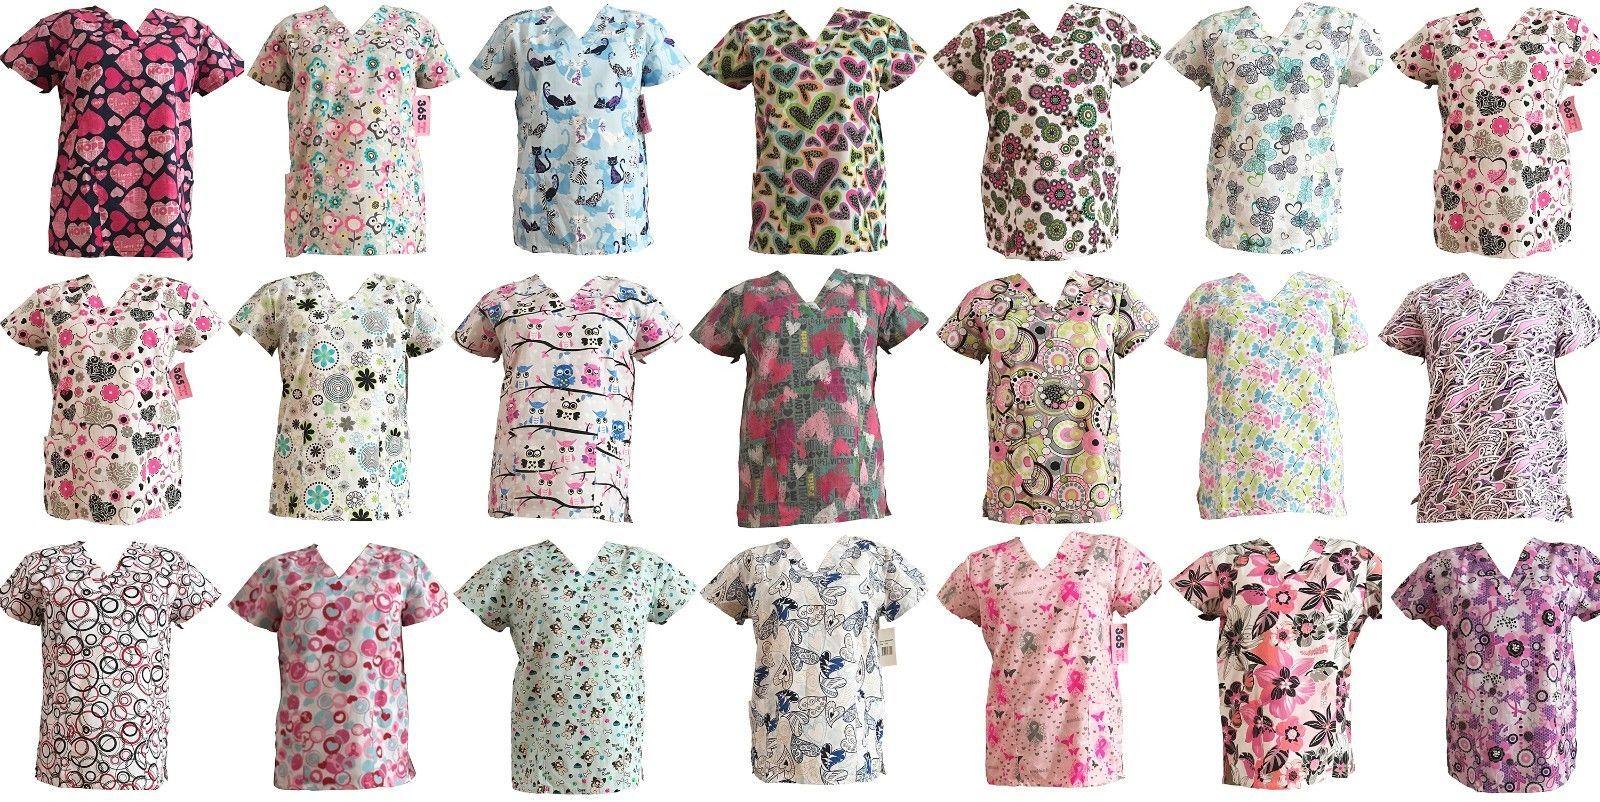 f3ffe461196 Scrubs 105419: 365 Work And Wear Women S Fashion Medical Nursing Scrub Tops  -> BUY IT NOW ONLY: $10.99 on #eBay #scrubs #women #fashion #medical # nursing # ...